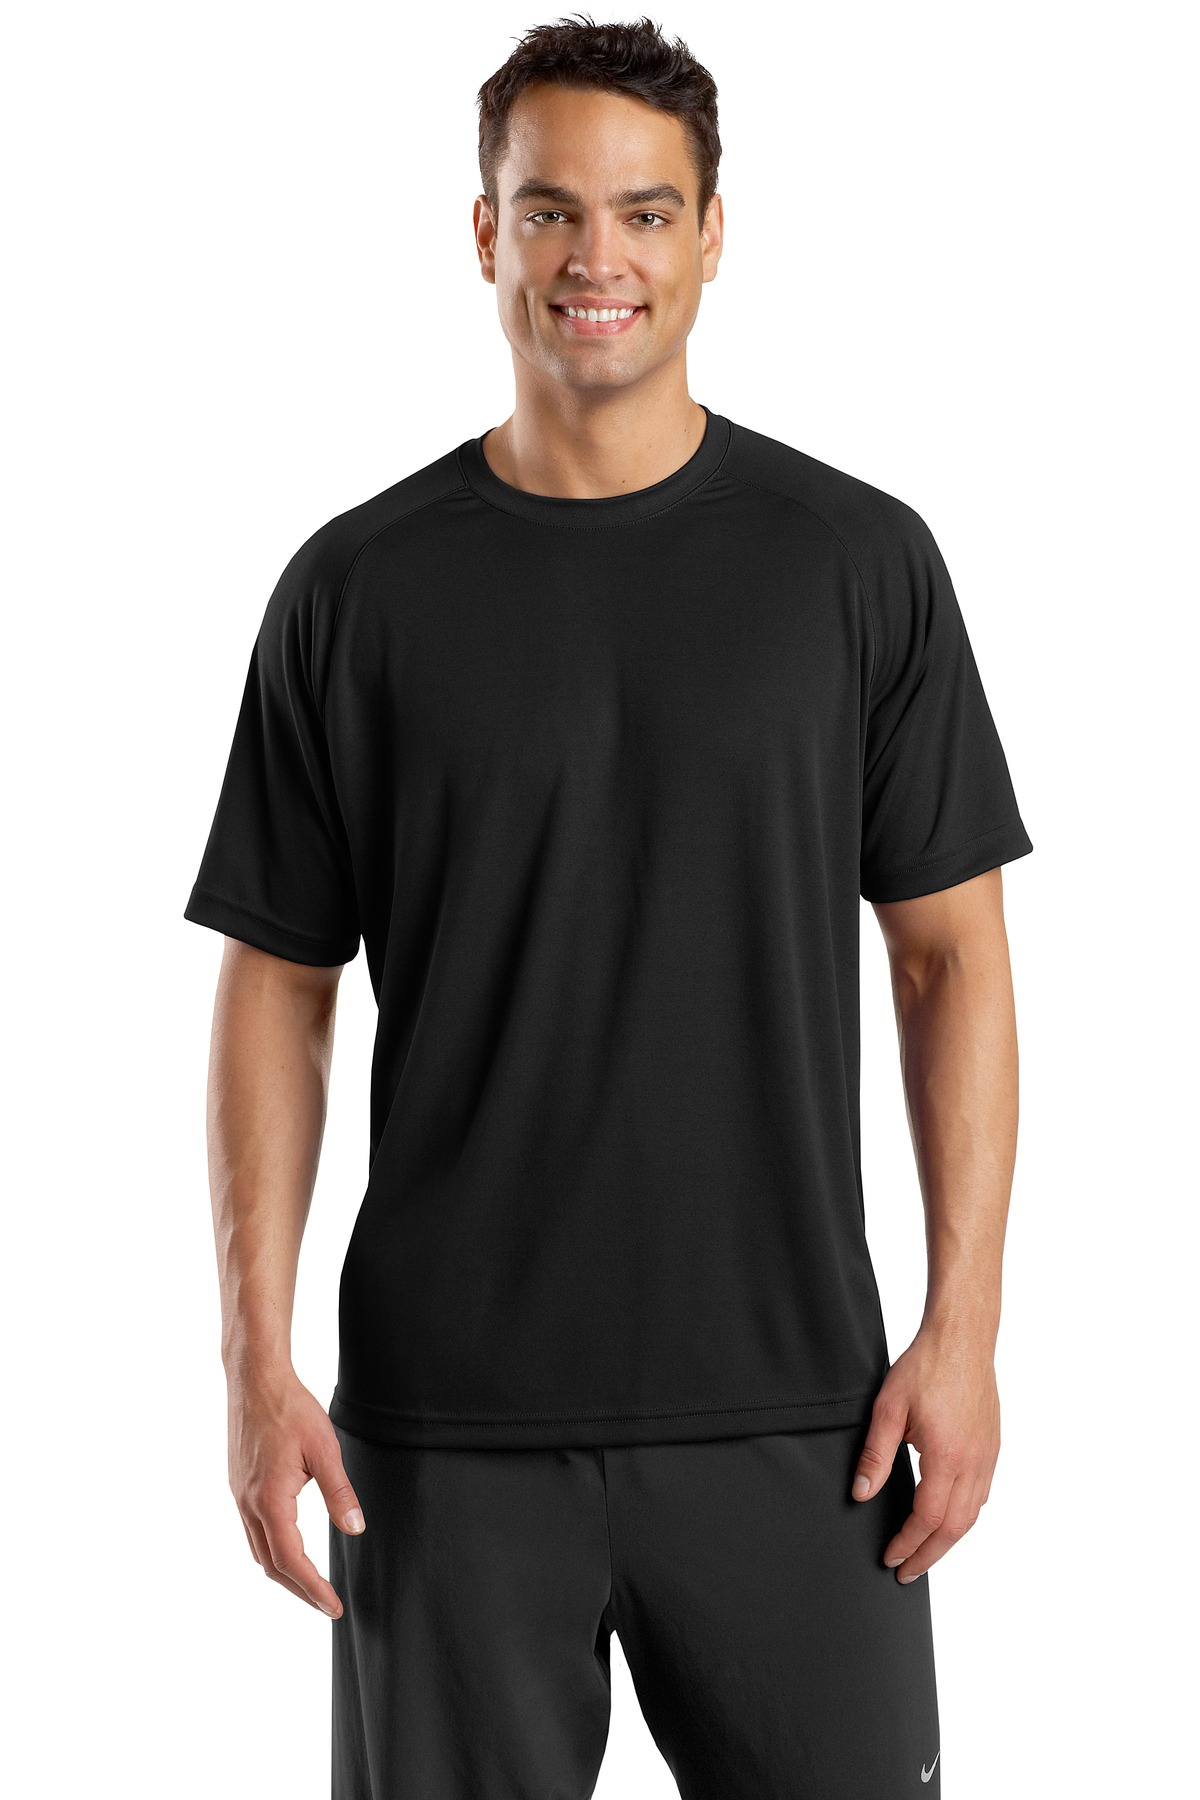 Black Shirt Model